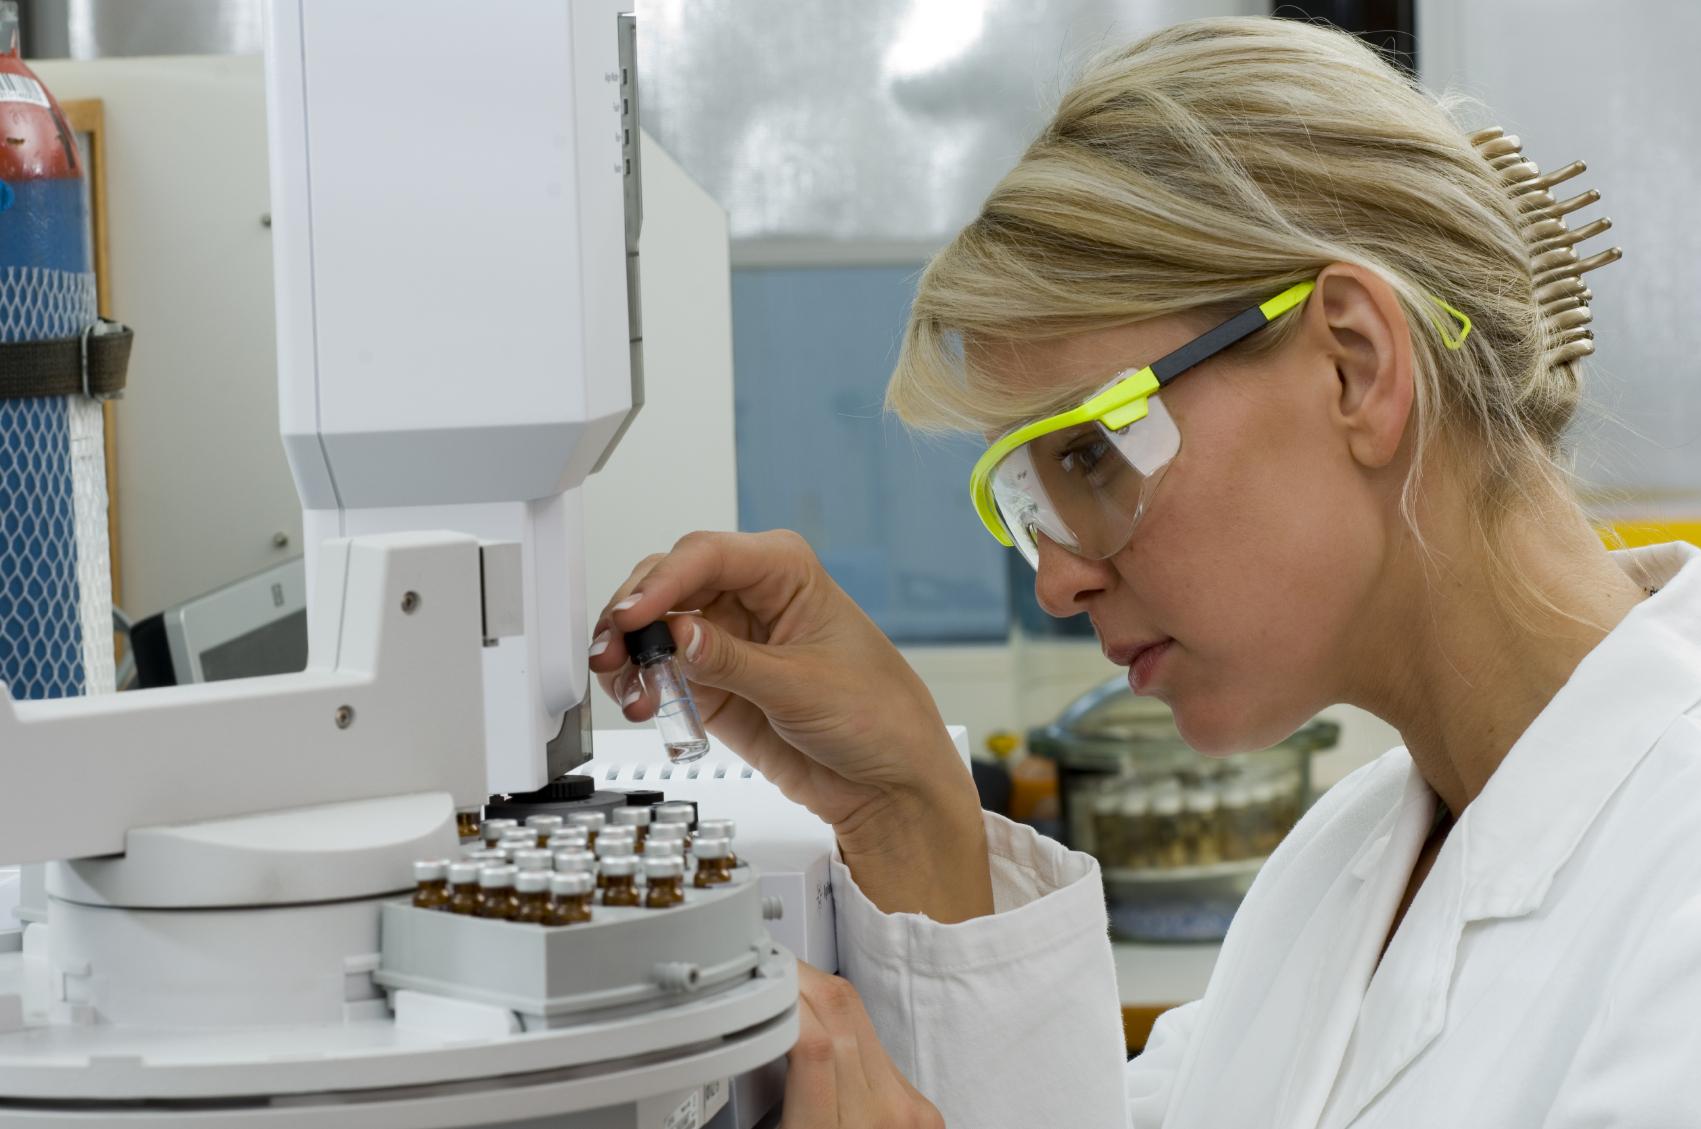 Coordinate bionanalysis activities ensuring efficient running of studies